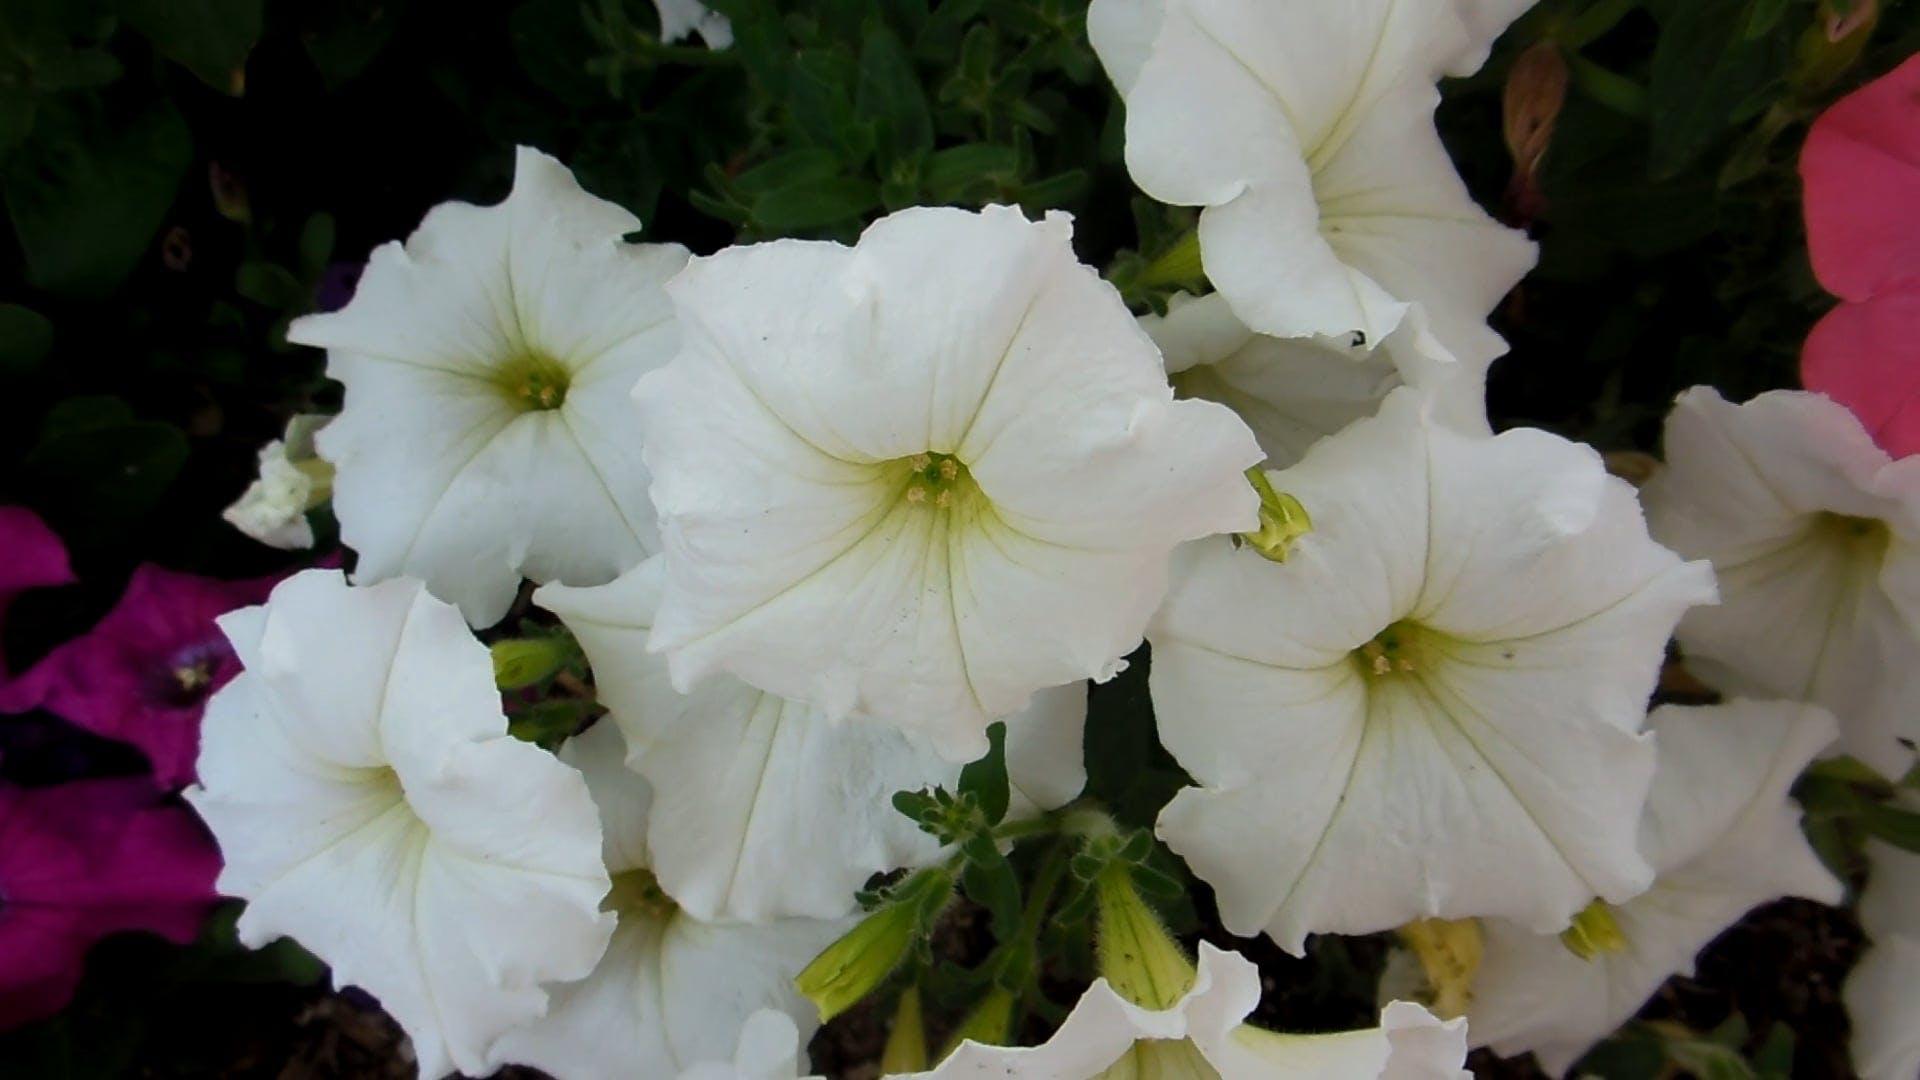 Summer Flowers On Breeze